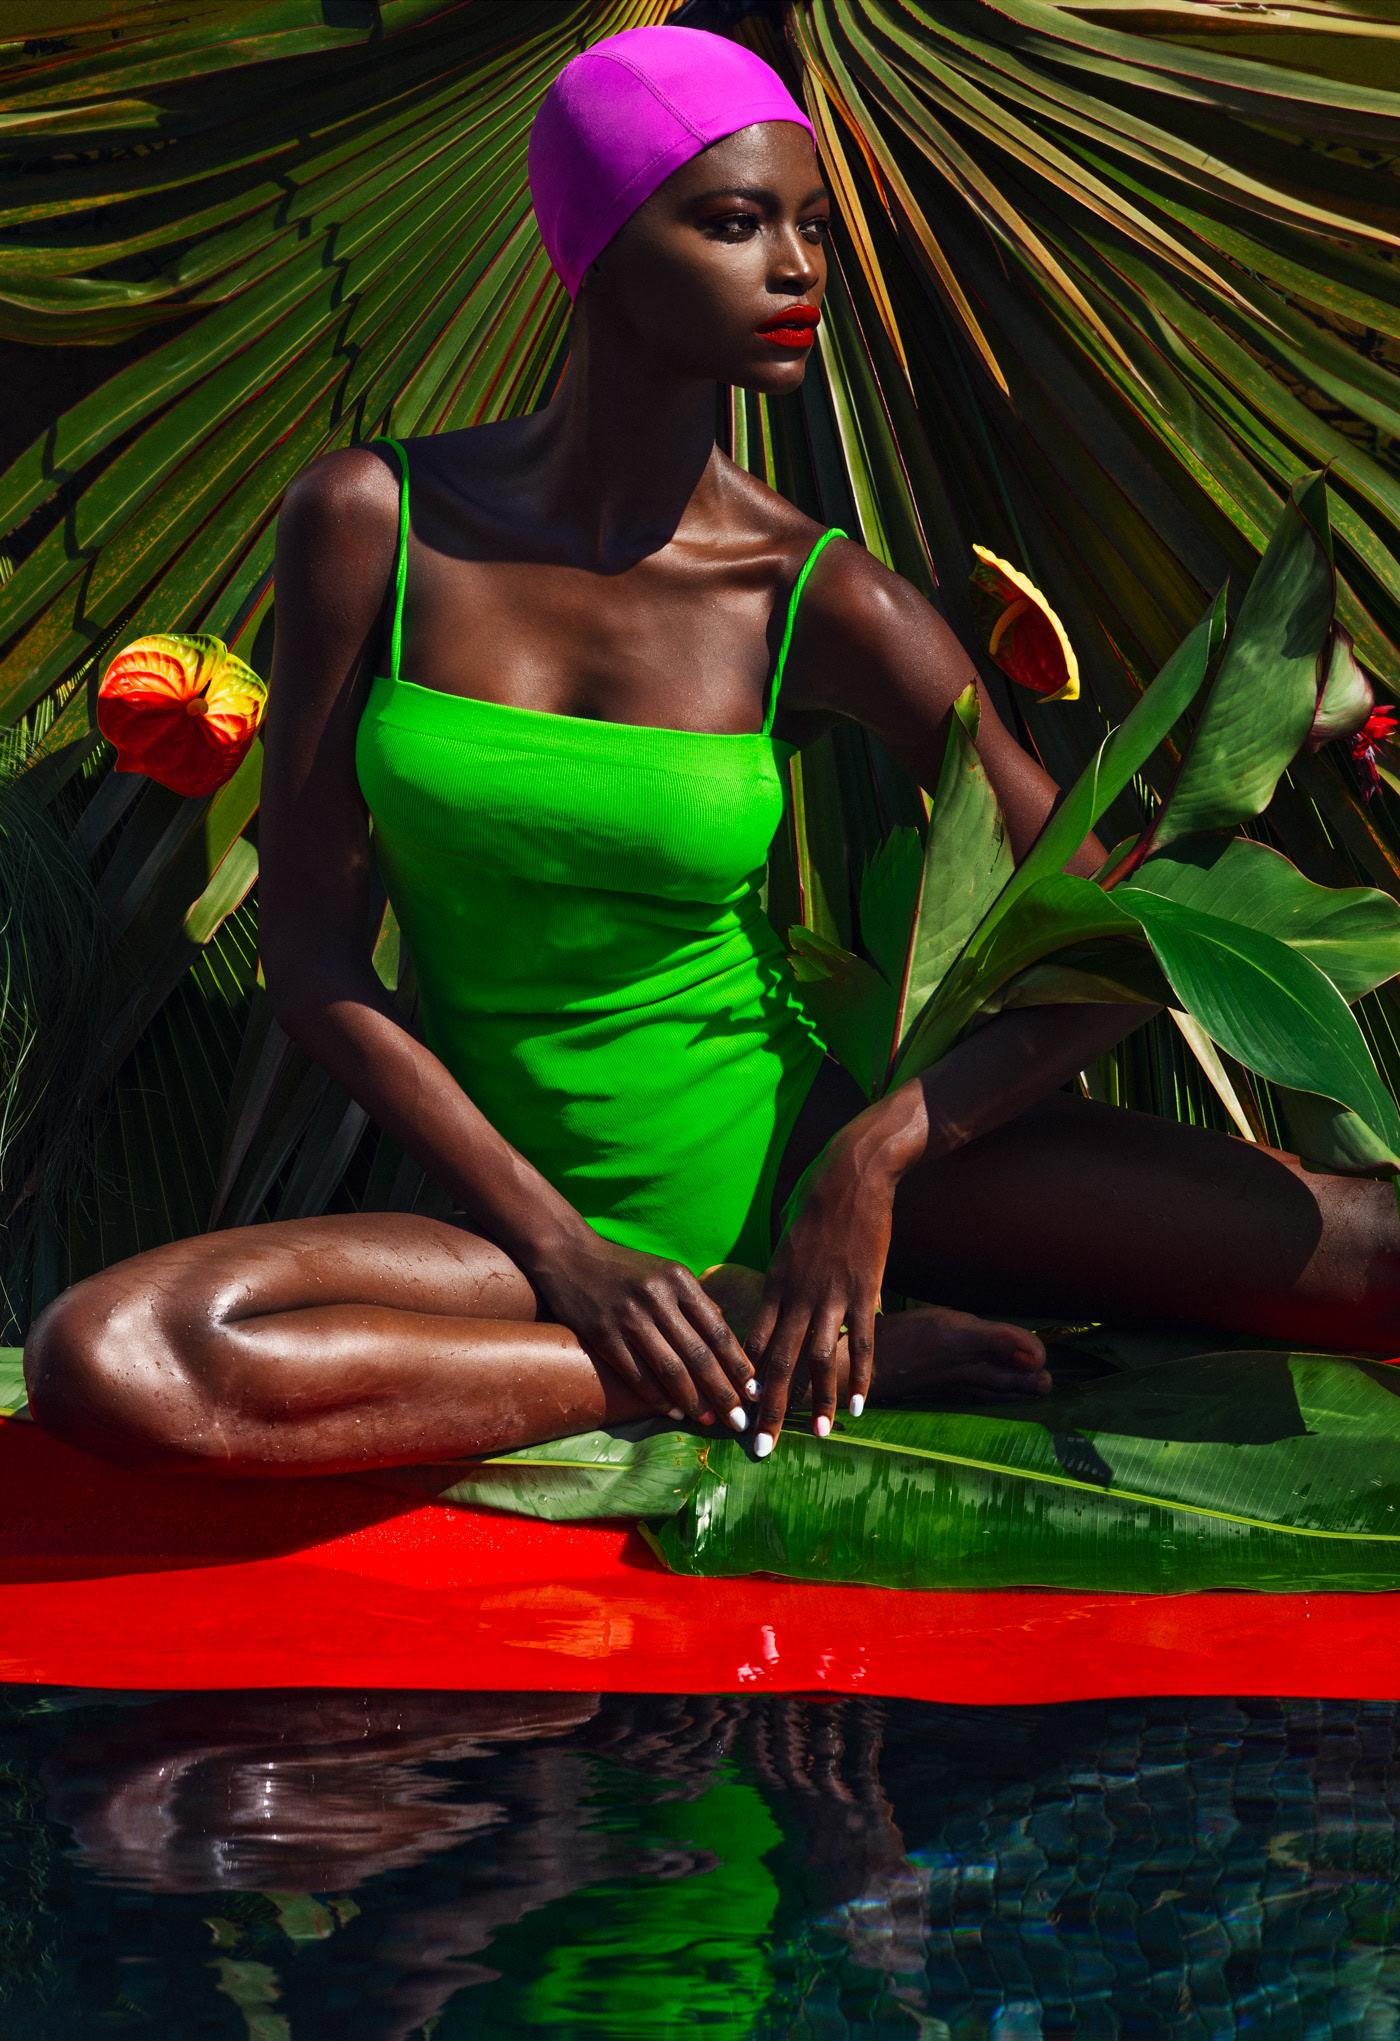 Dreamer Pool - A Riot Of Color / фотограф Elena Iv-skaya